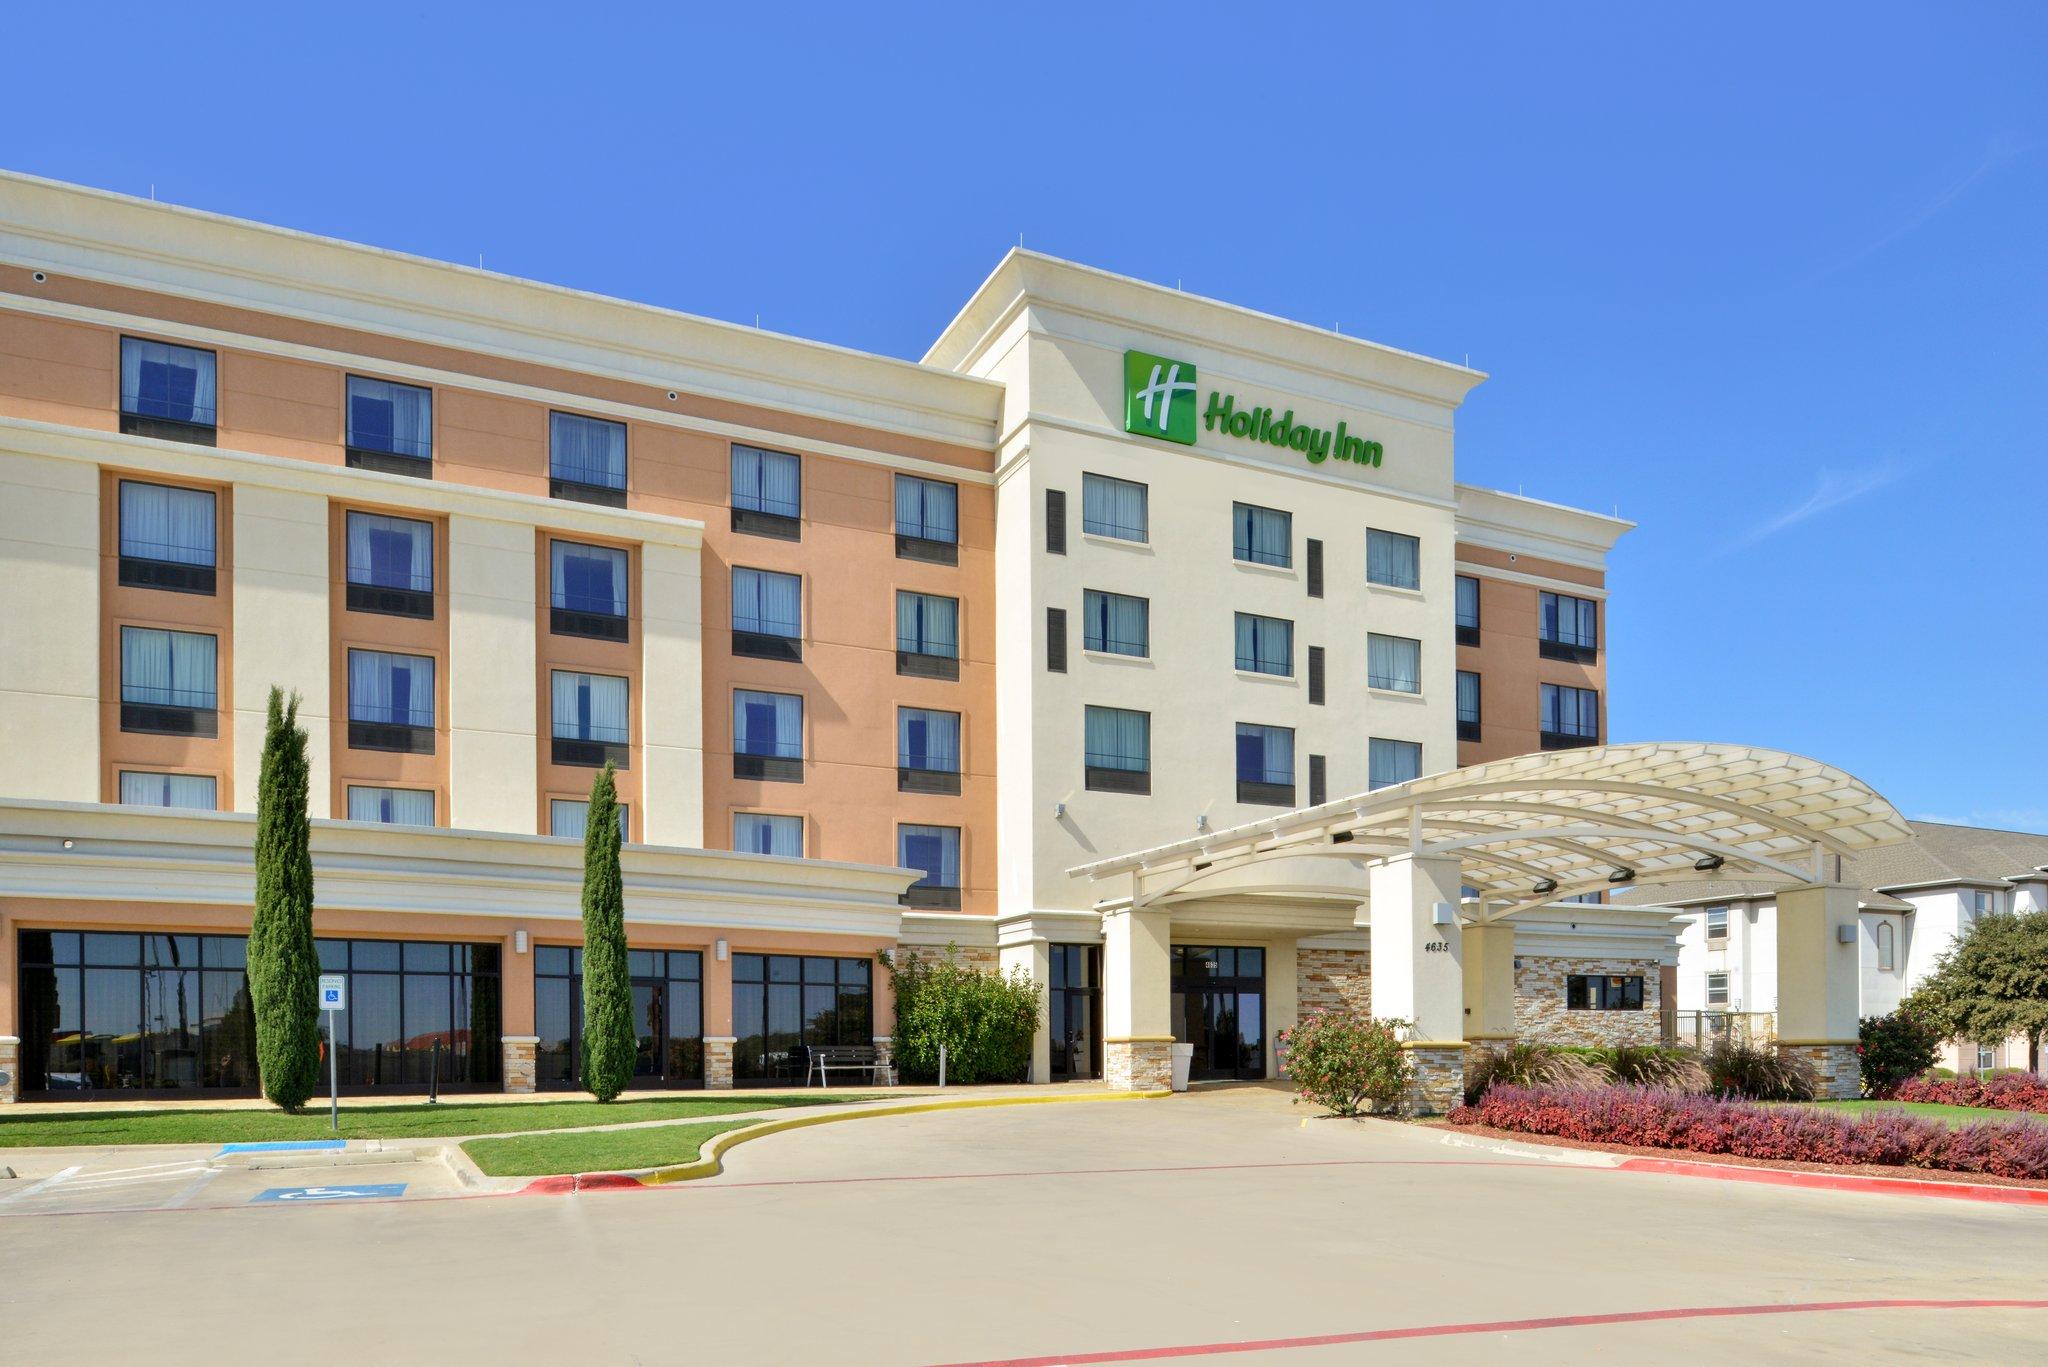 Holiday Inn Fort Worth North-FossilCreek